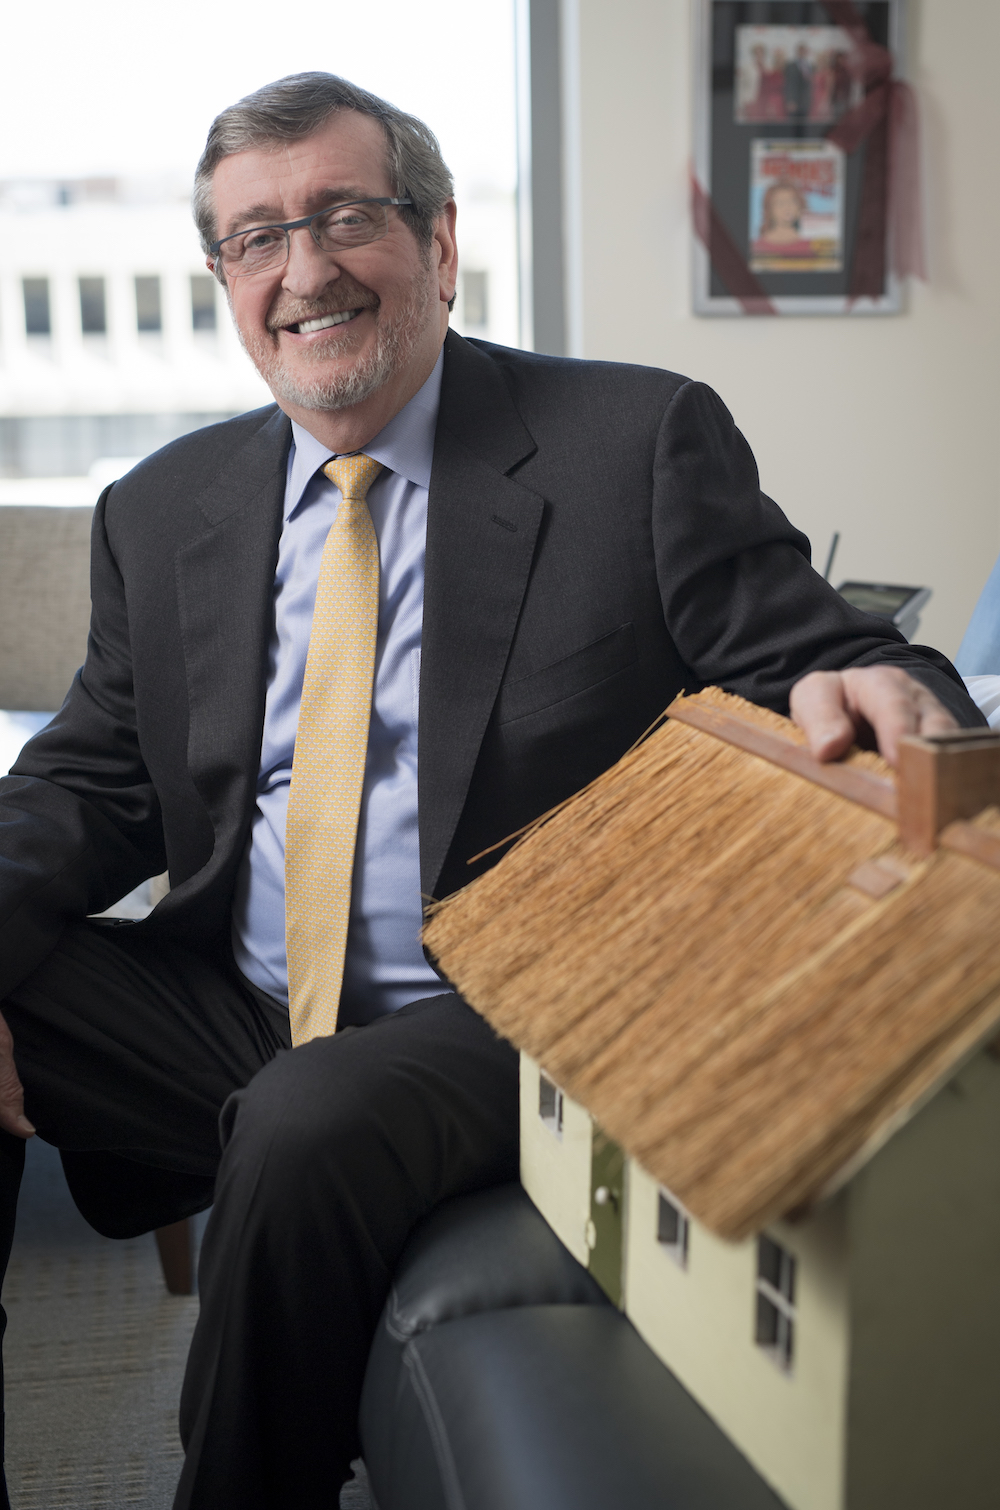 CNN: Business Northwell Health CEO